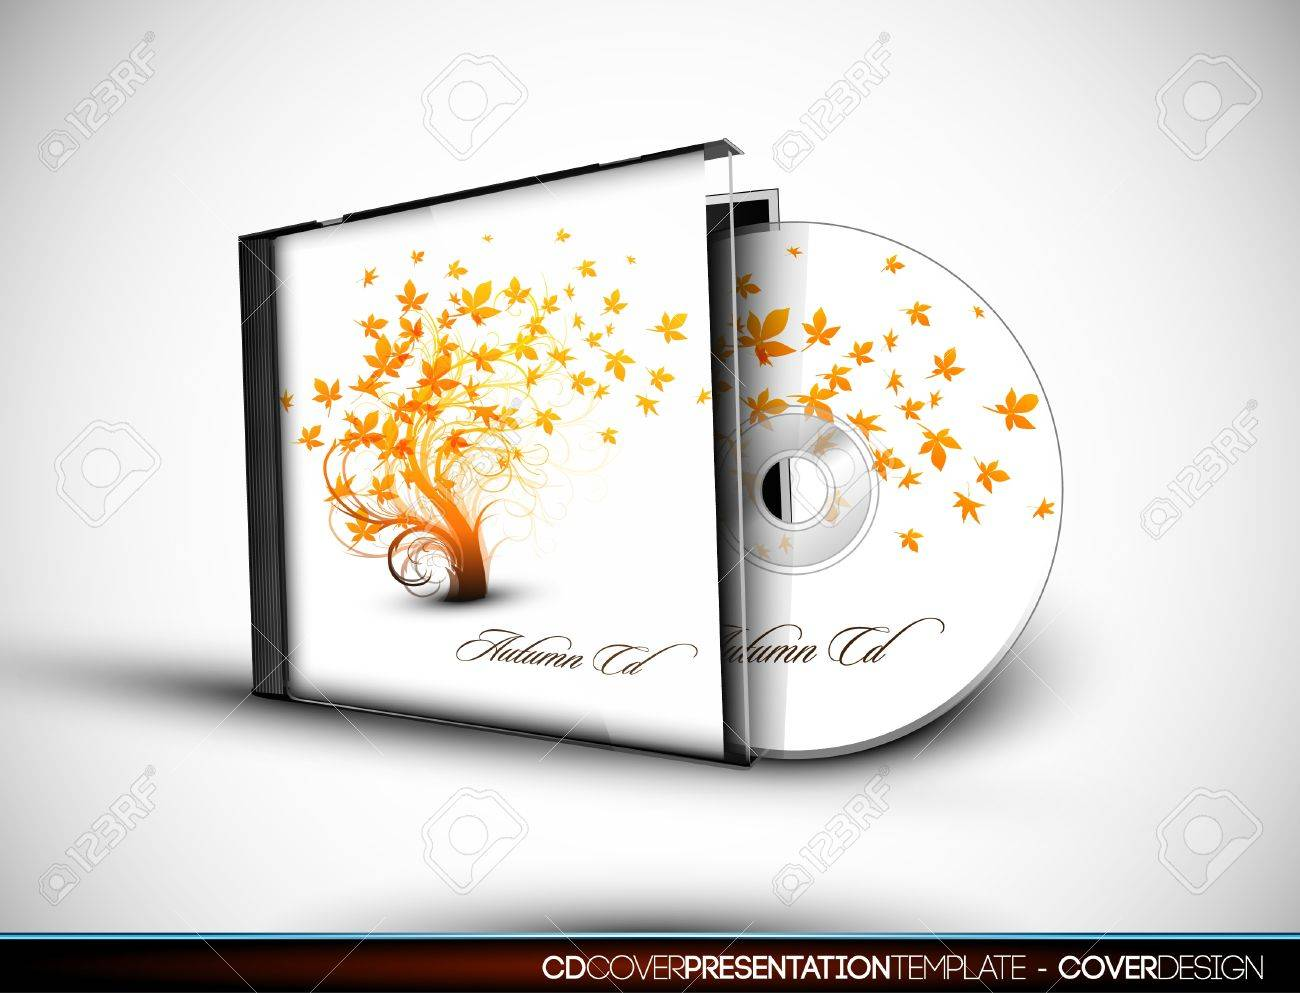 Flourish CD Cover Design 3D Con Capas De Presentación De Plantillas ...